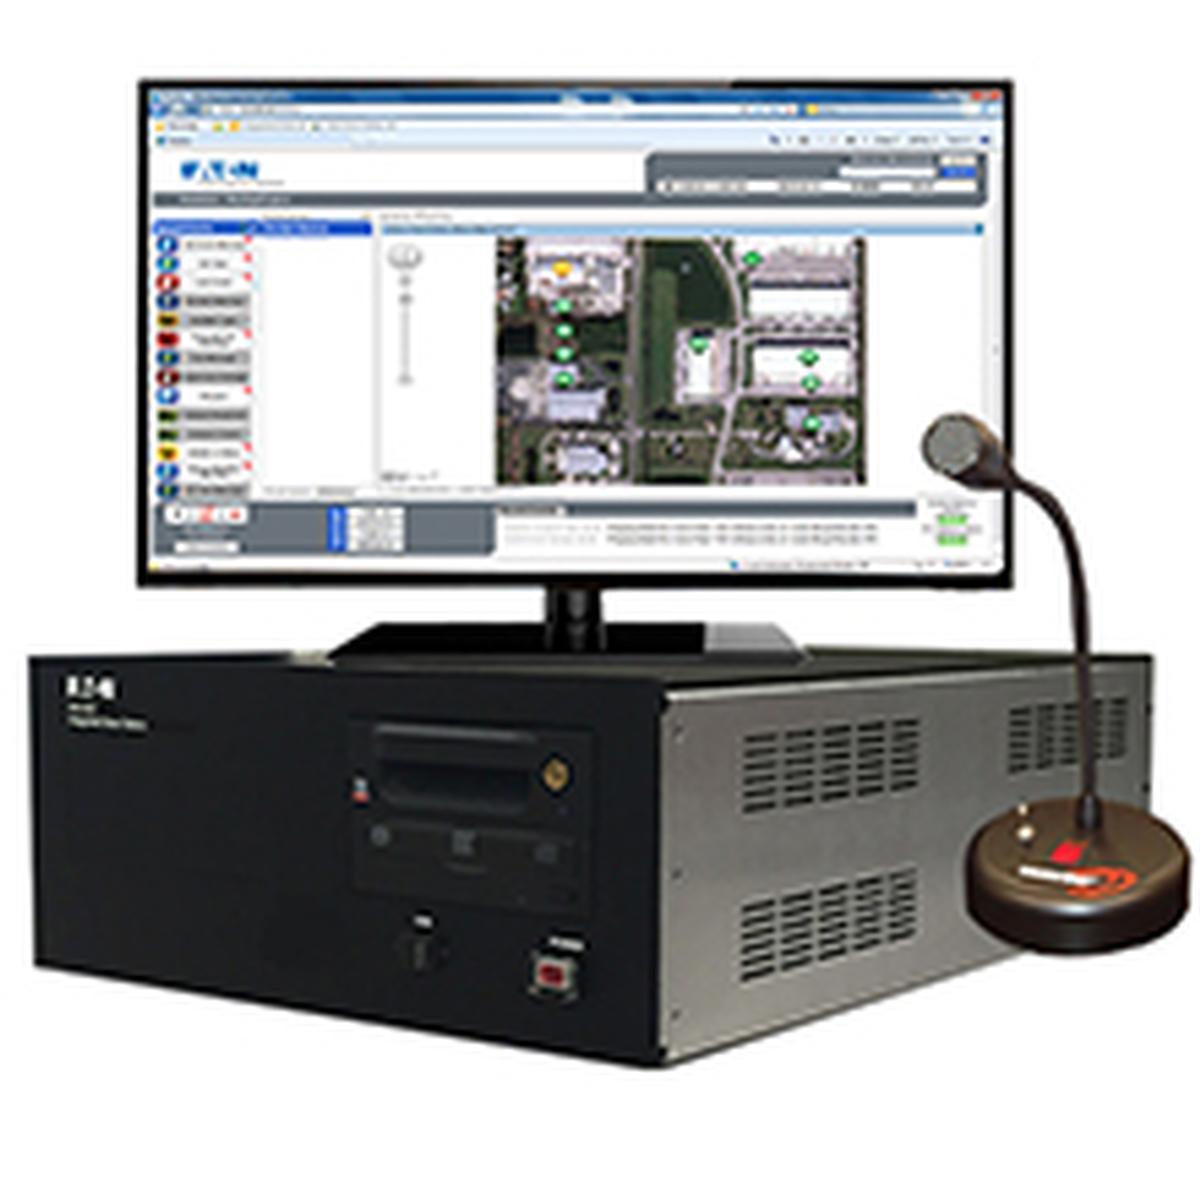 Ibs 0332 Hd Ipc Integrated Base Station With Ipc Eaton